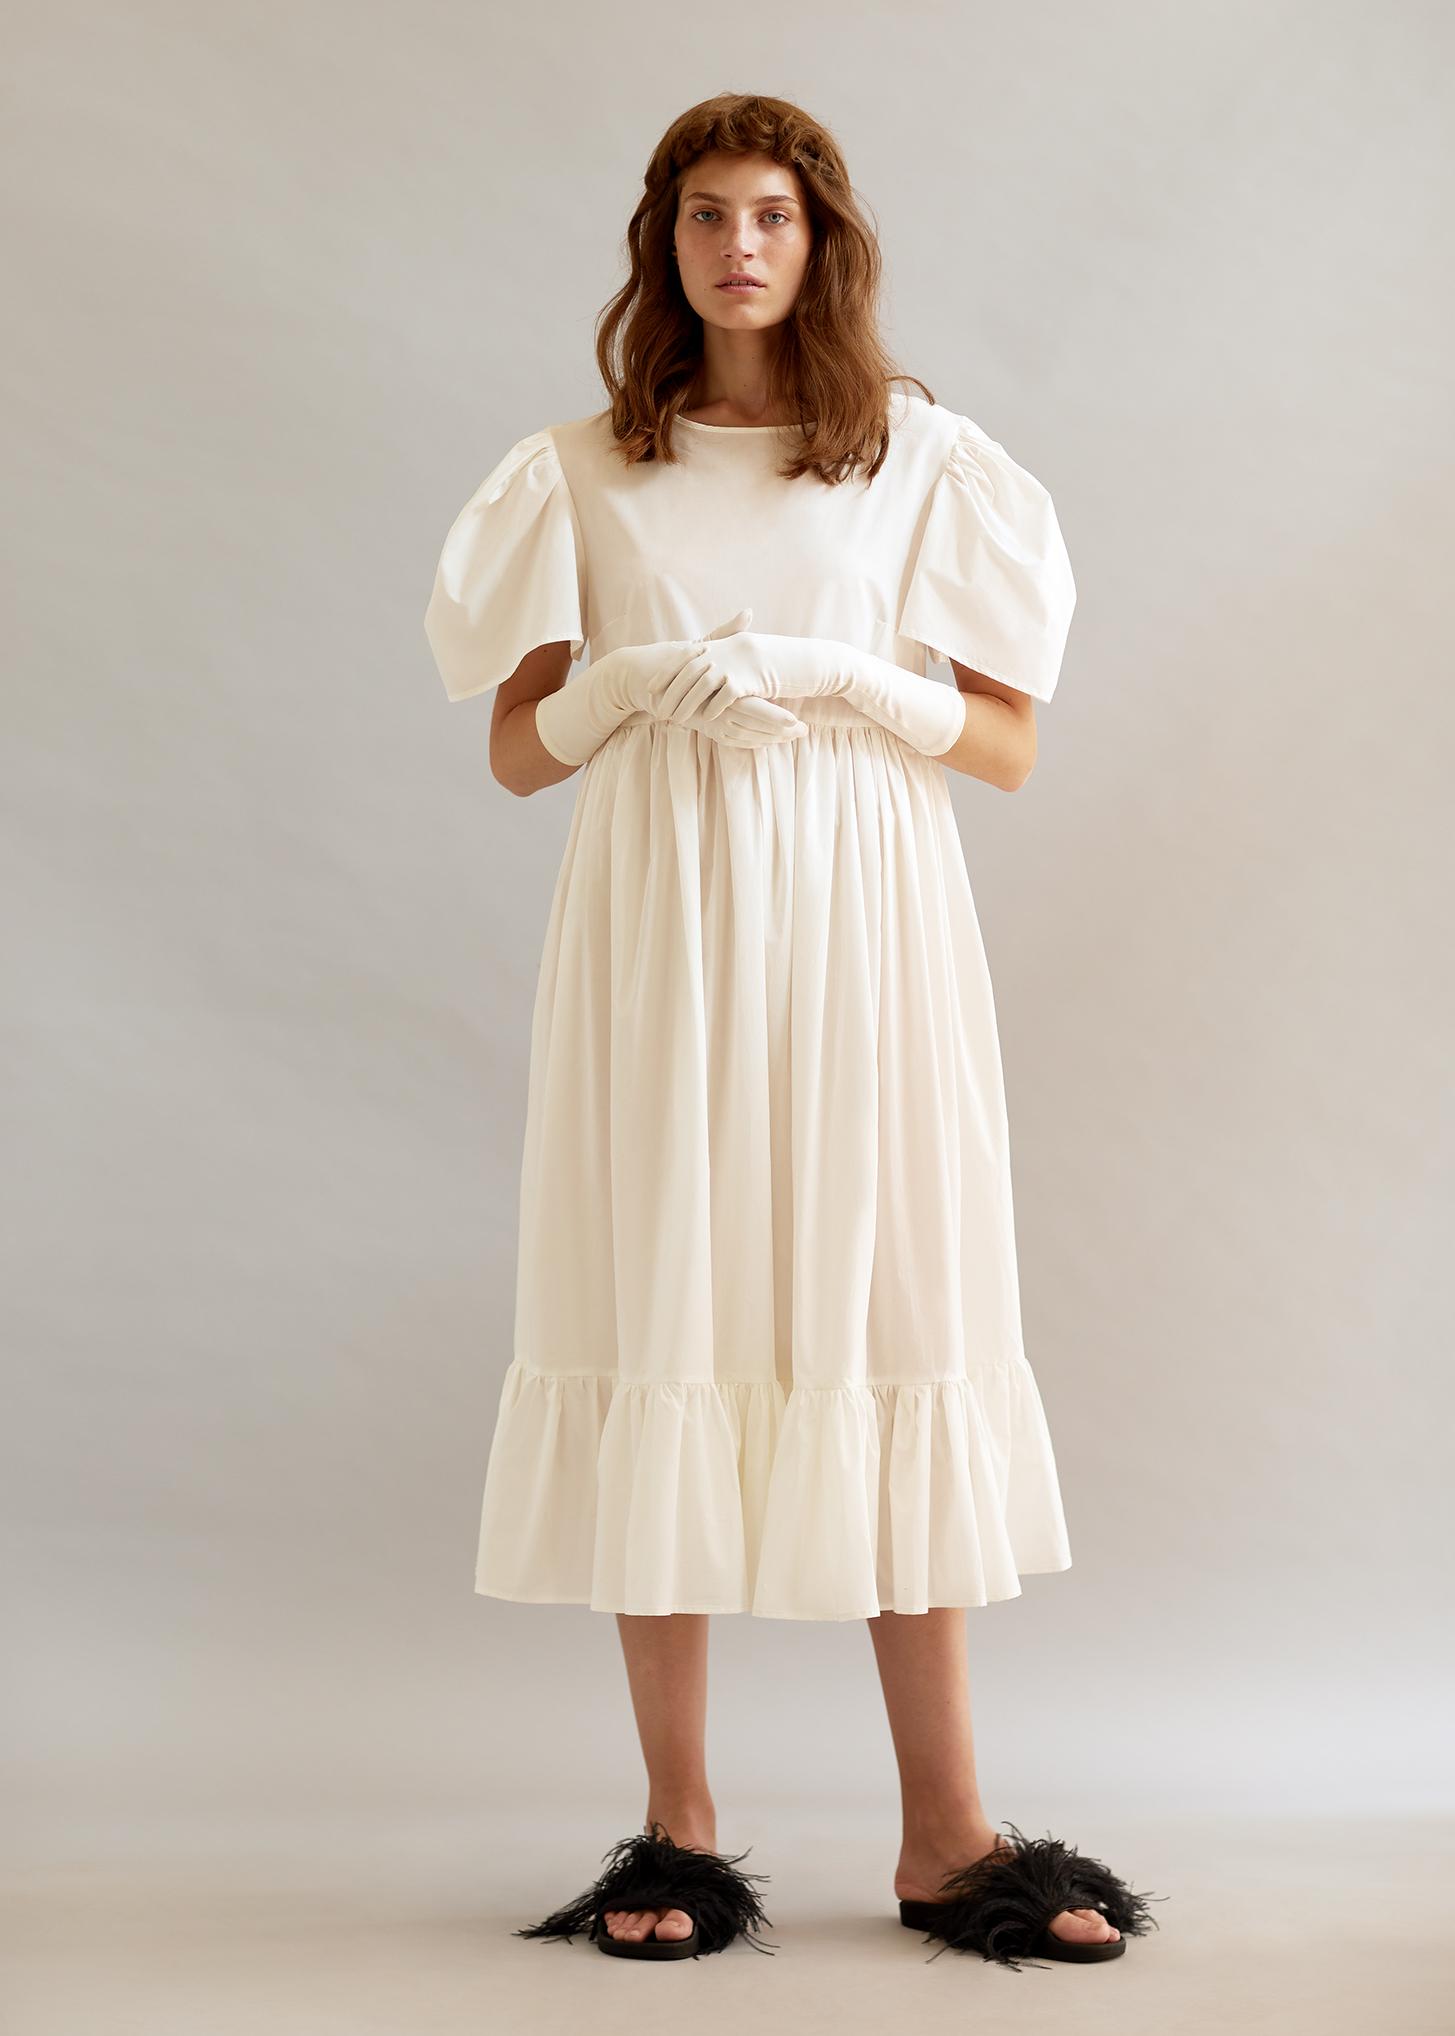 Elizaveta Dress by Naya Rea on curated-crowd.com